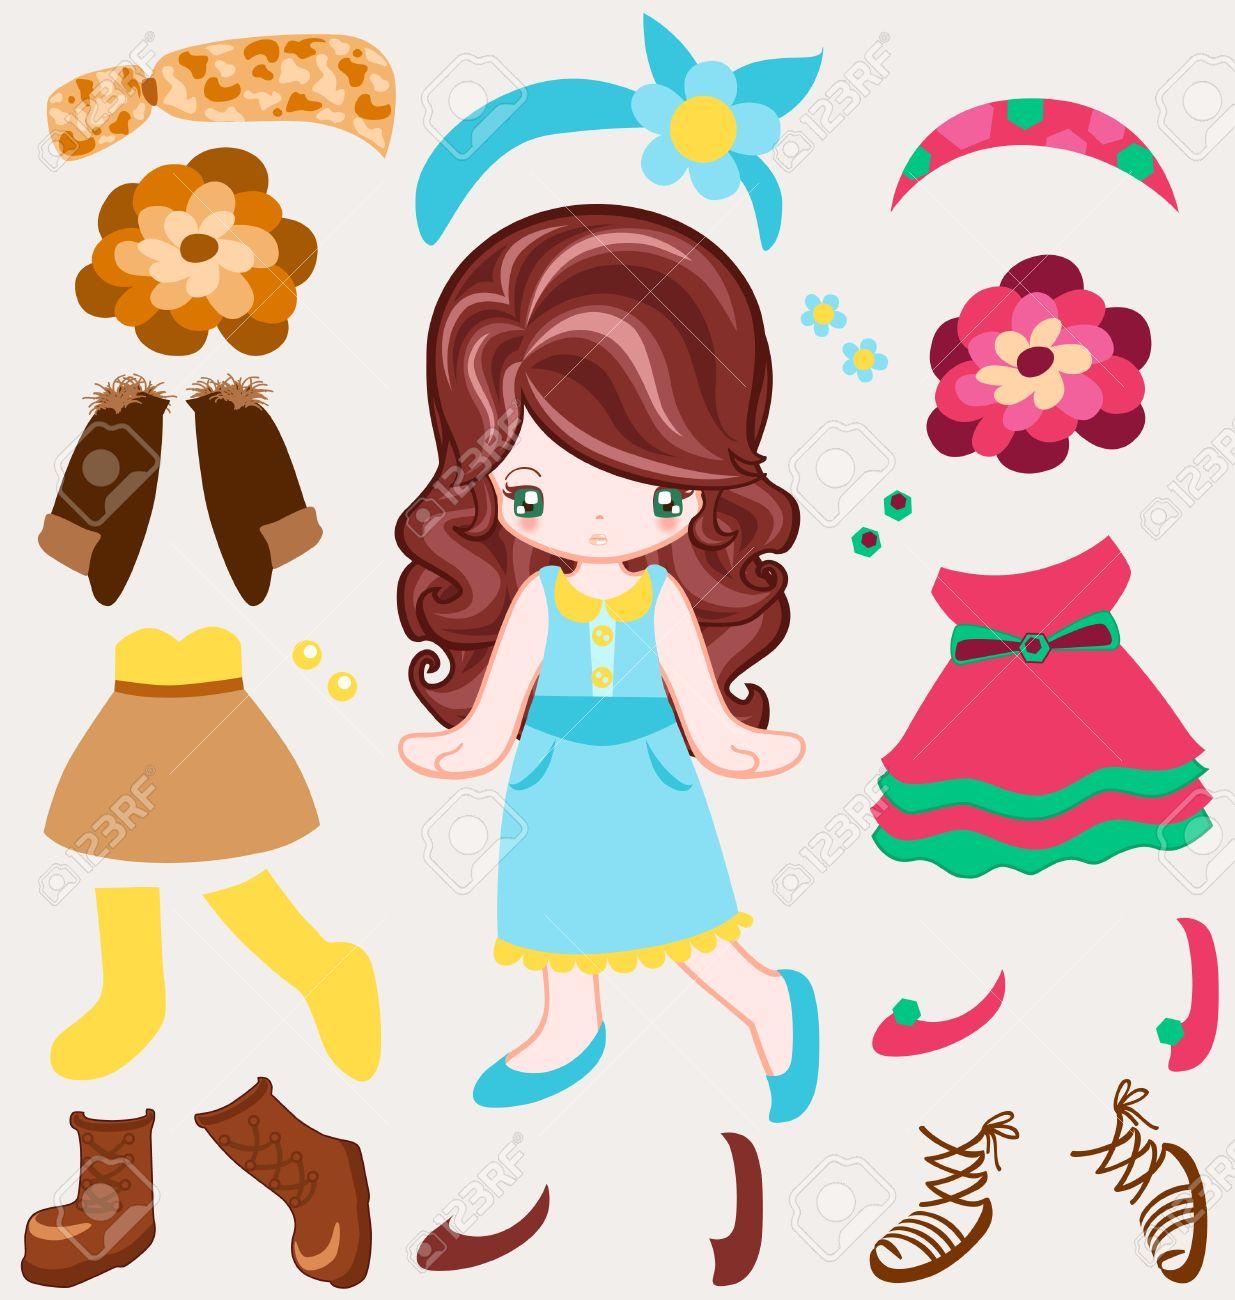 Dress up for girl - Illustration Of Girl Dressing Up Vintage Style Stock Vector 17005123